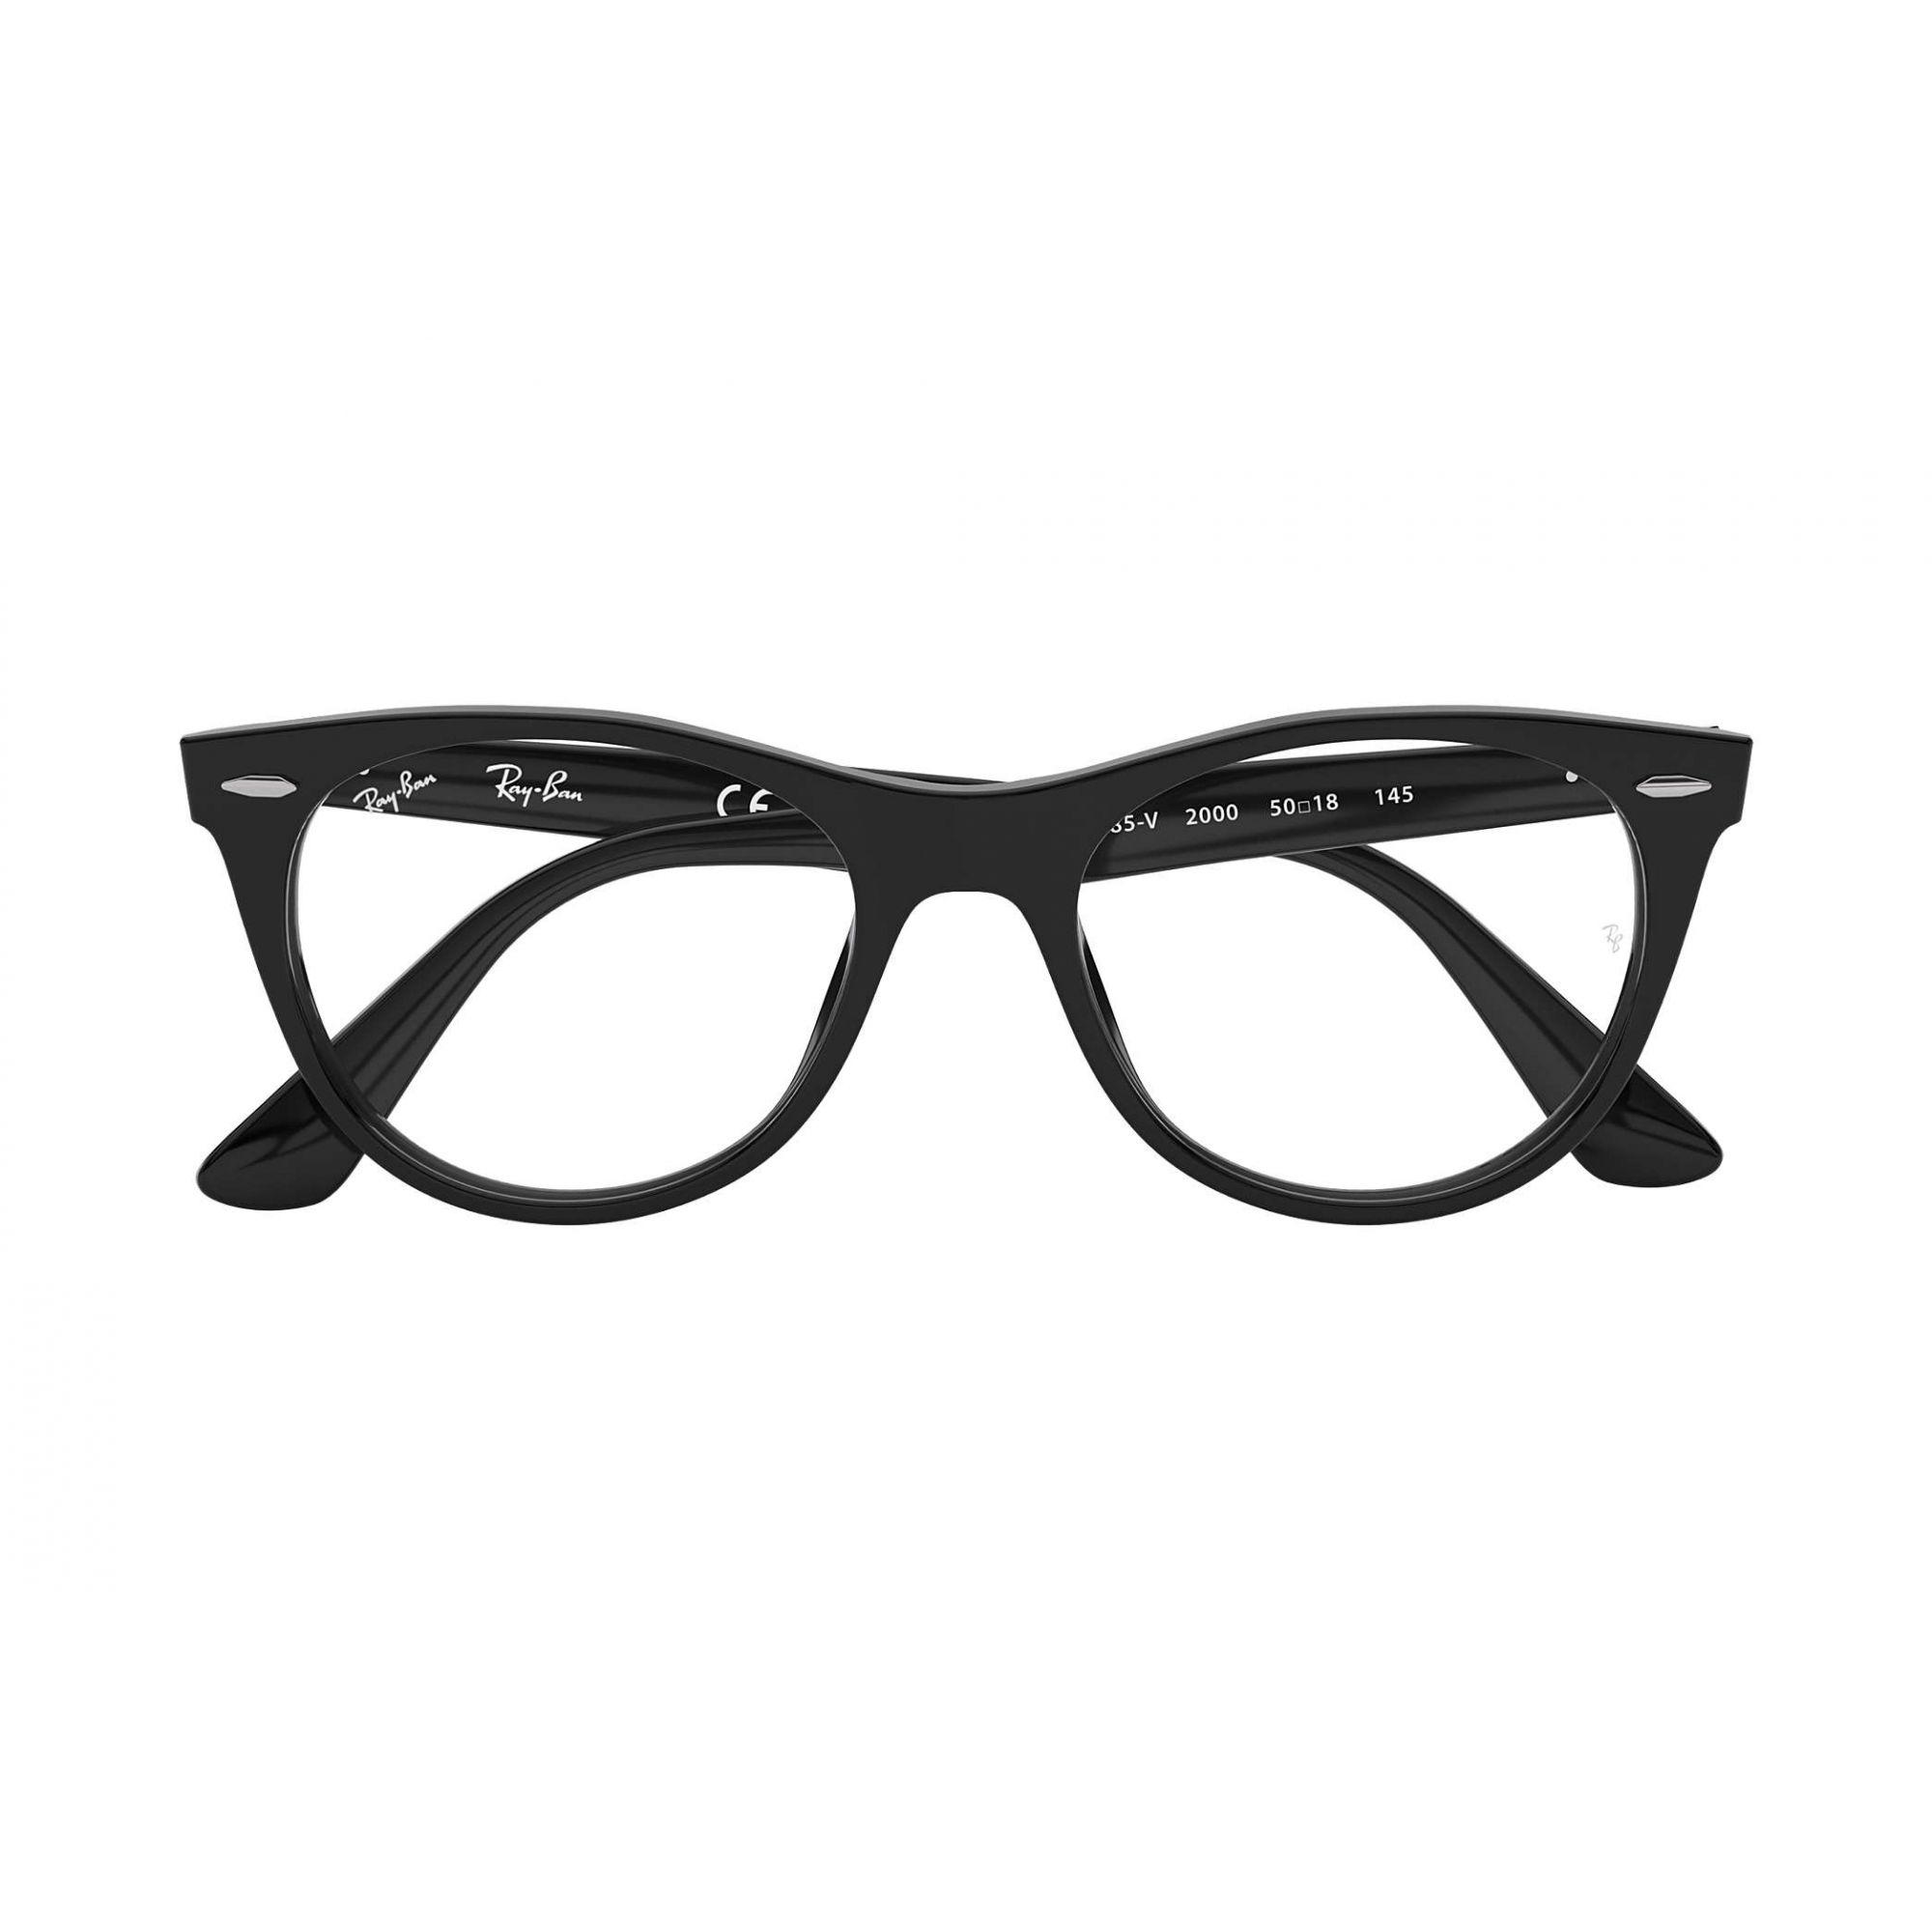 Ray Ban - RB2185V 2000 - Óculos de grau